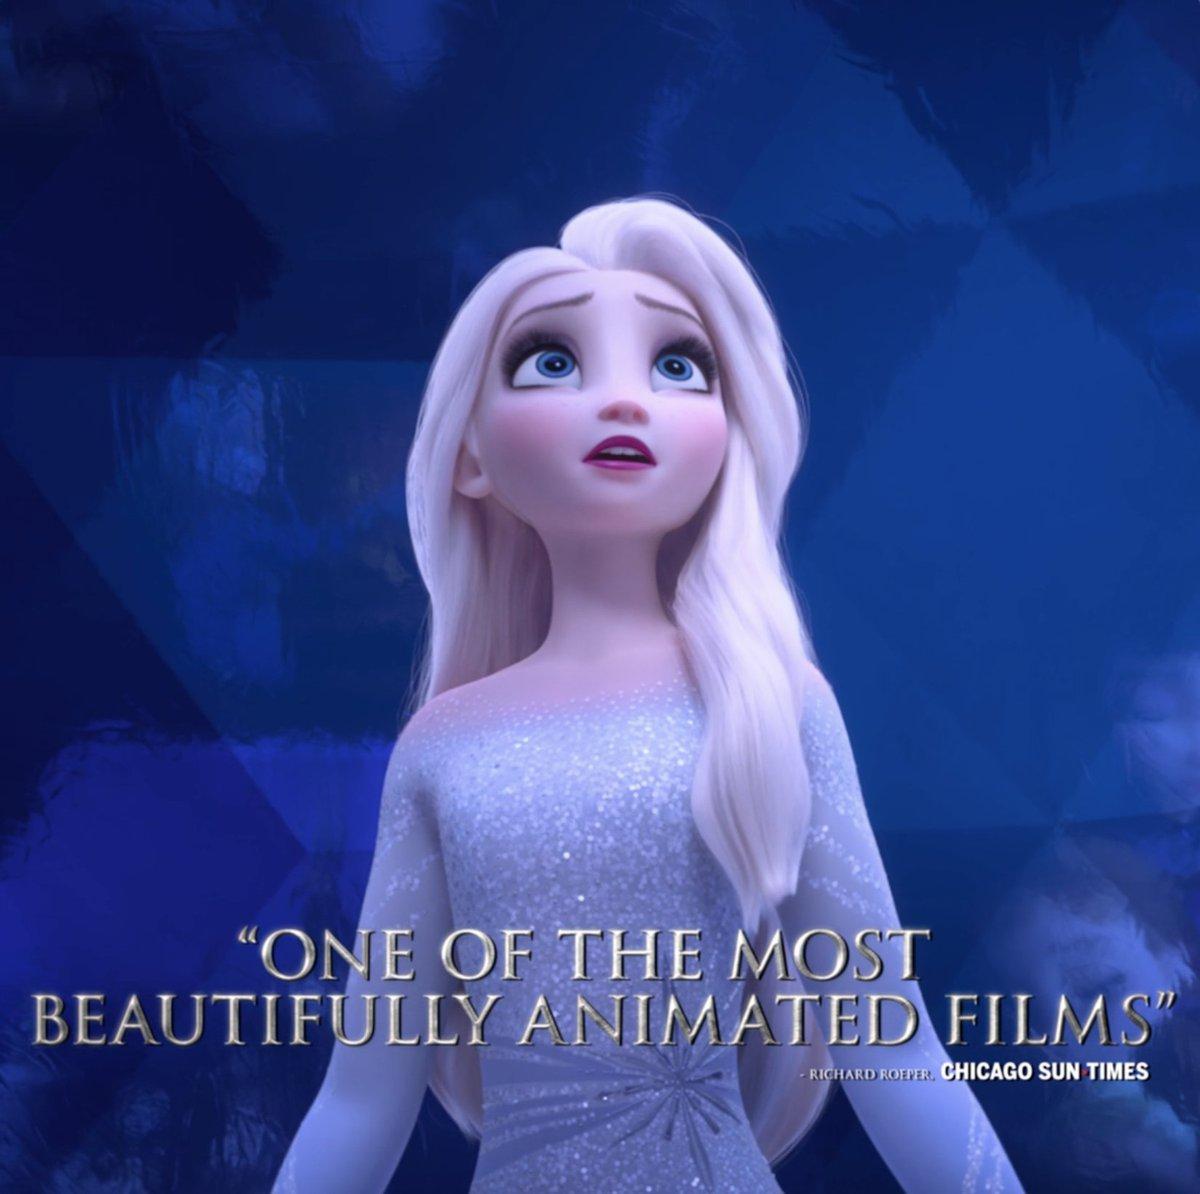 @DisneyFrozen's photo on #Frozen2